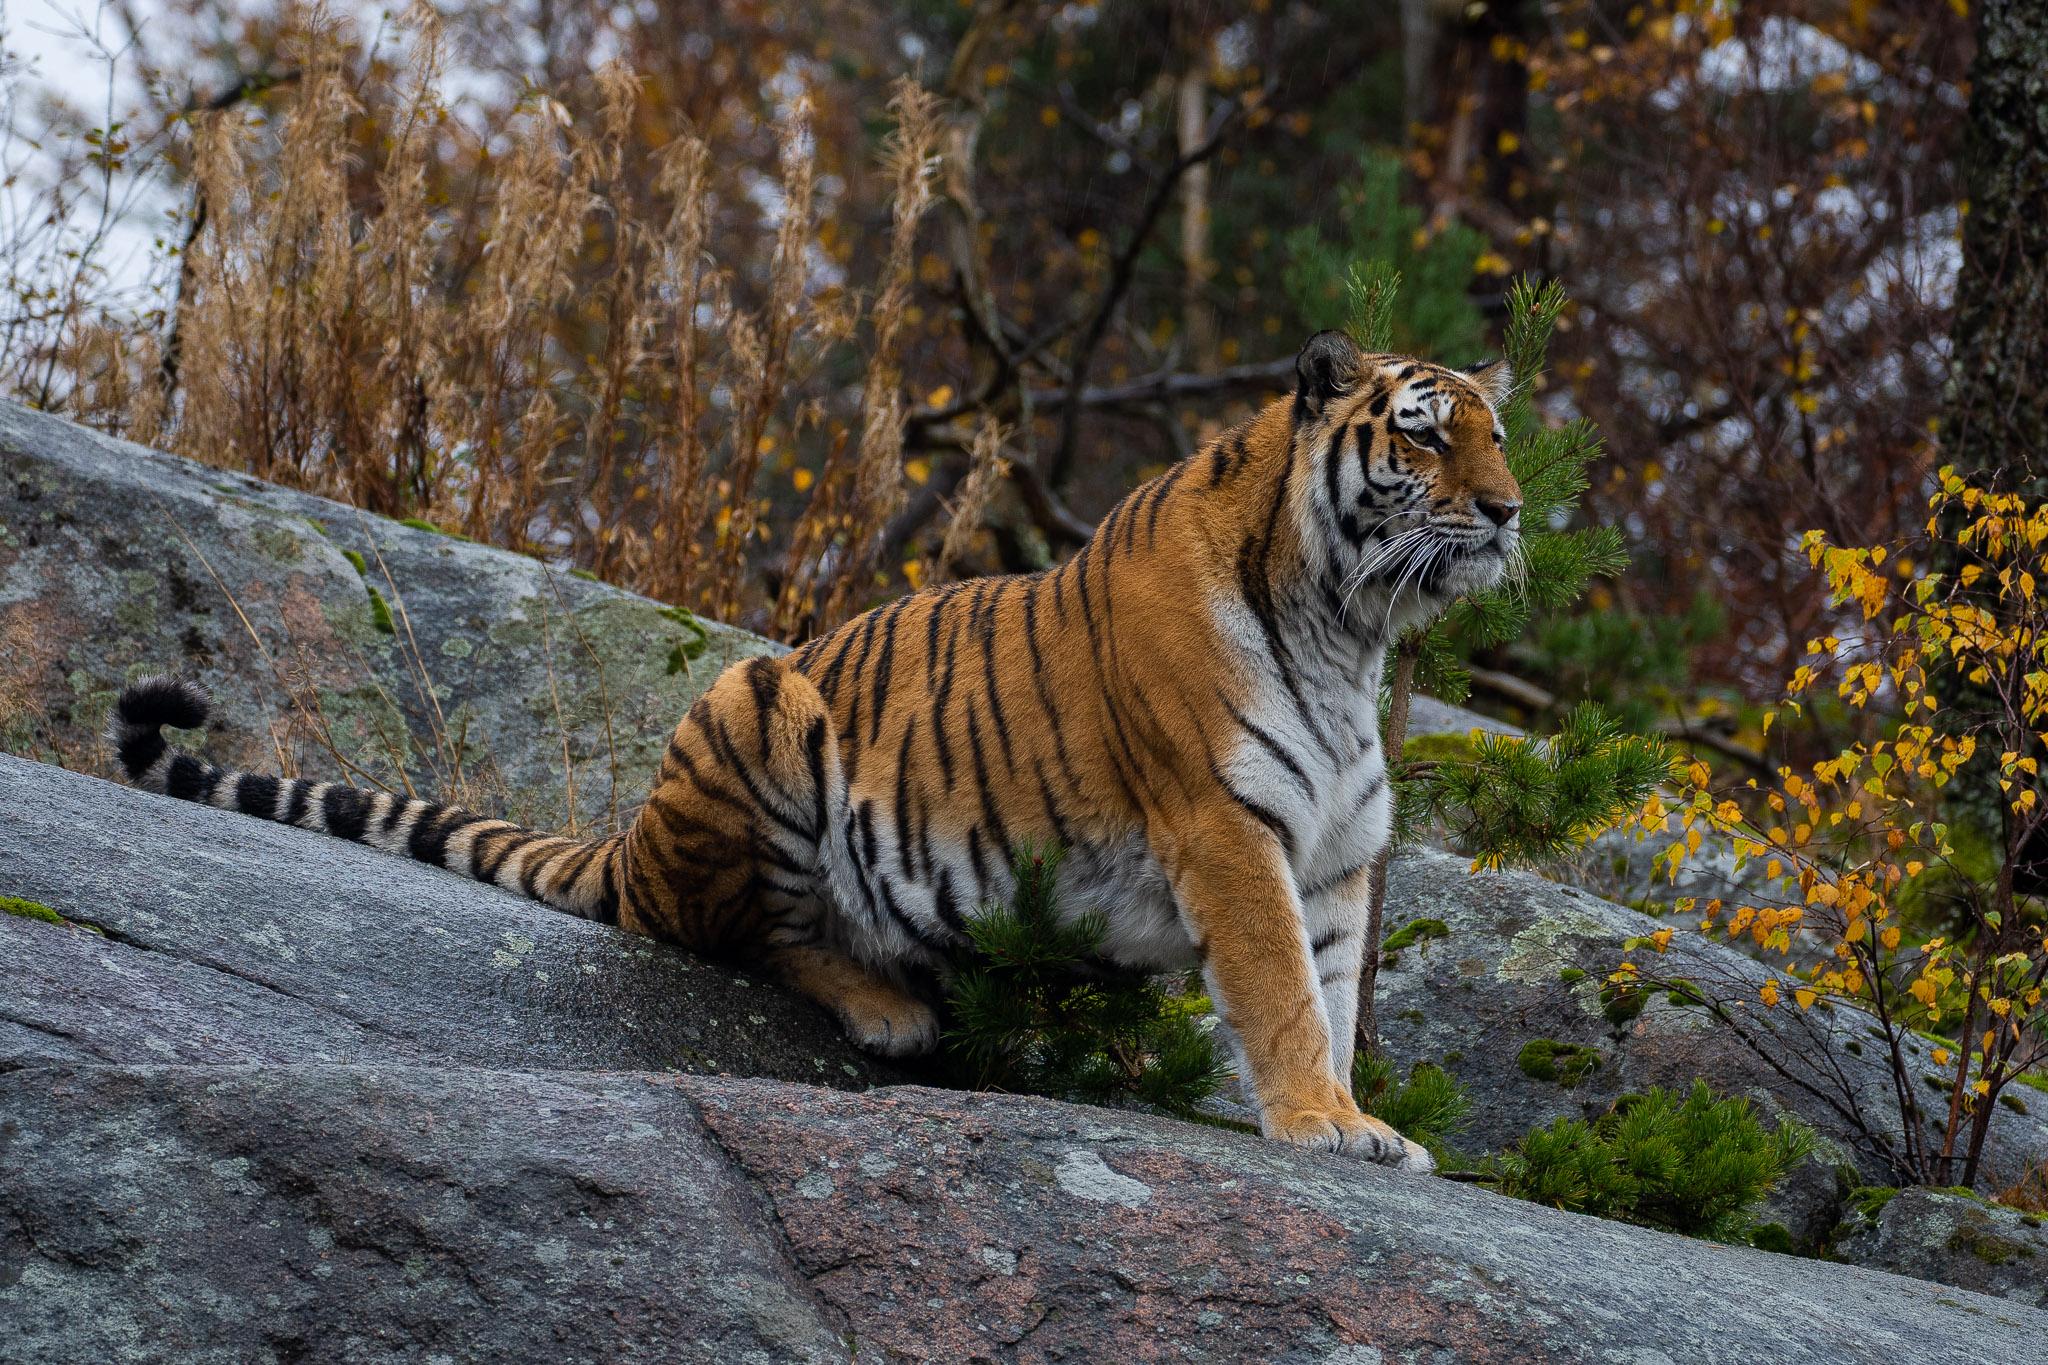 Mächtiges Tigerli